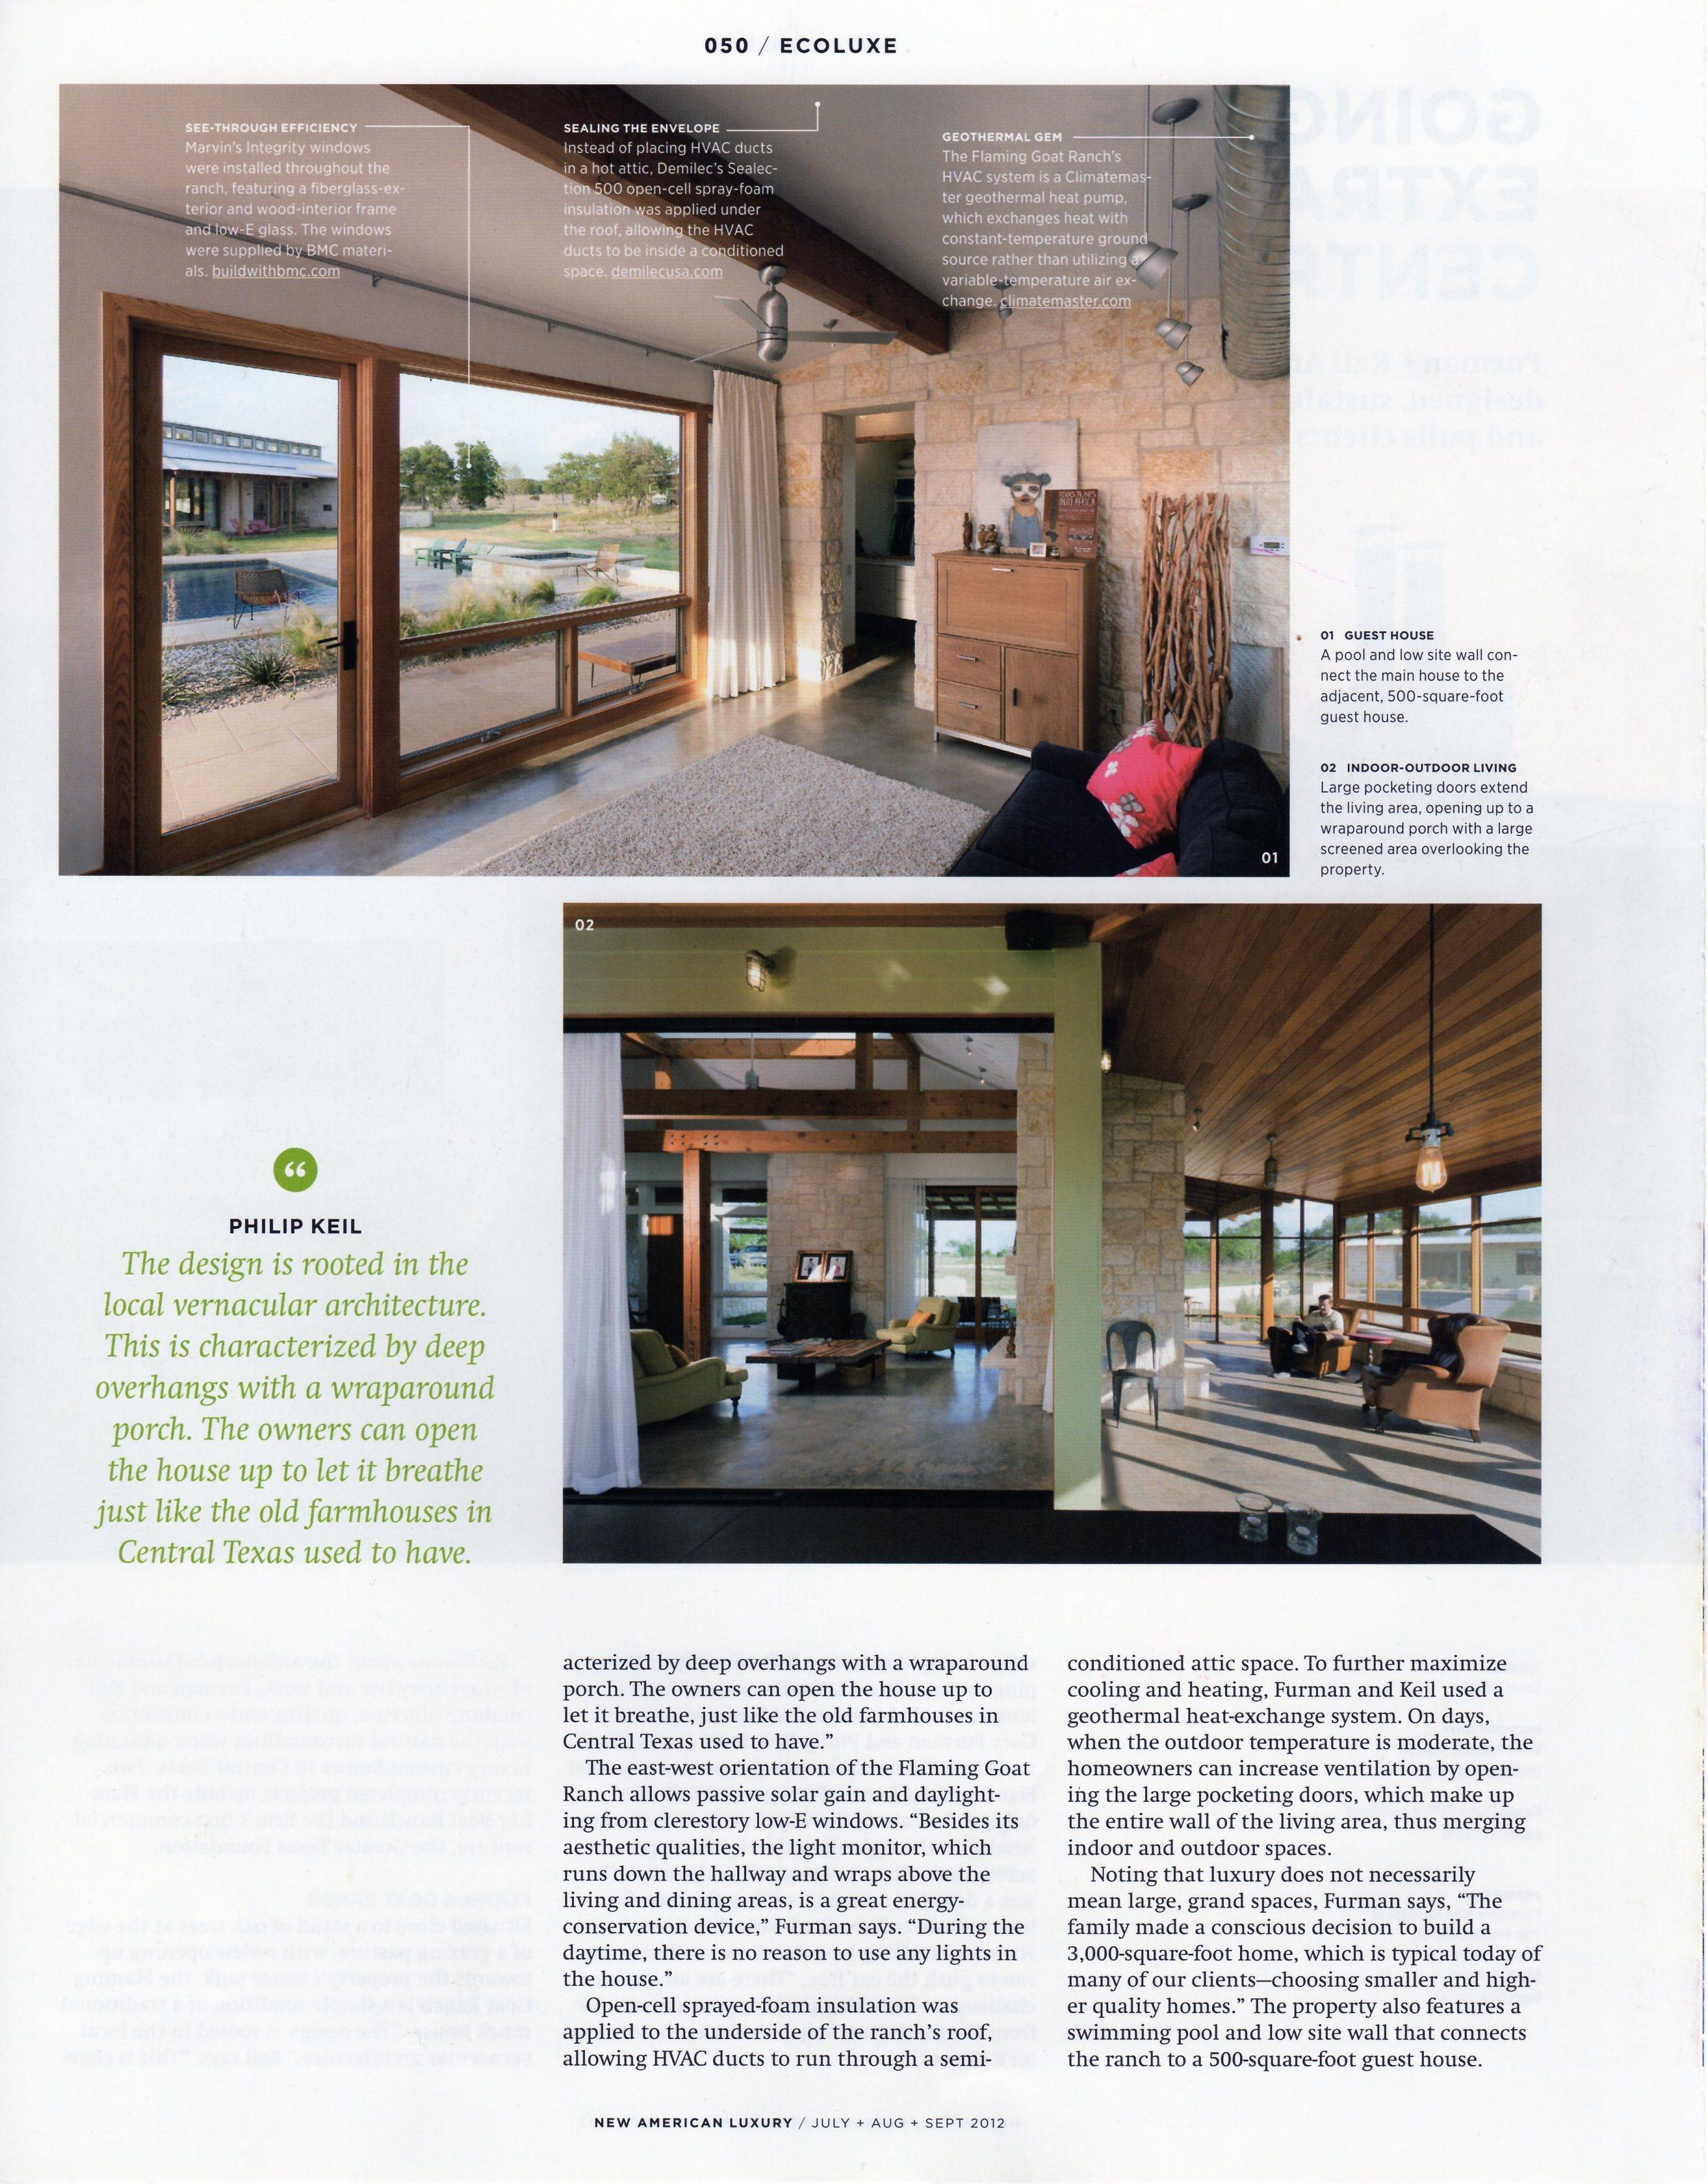 furman_keil_architects_flaming_goat_new_american_luxury2.jpg